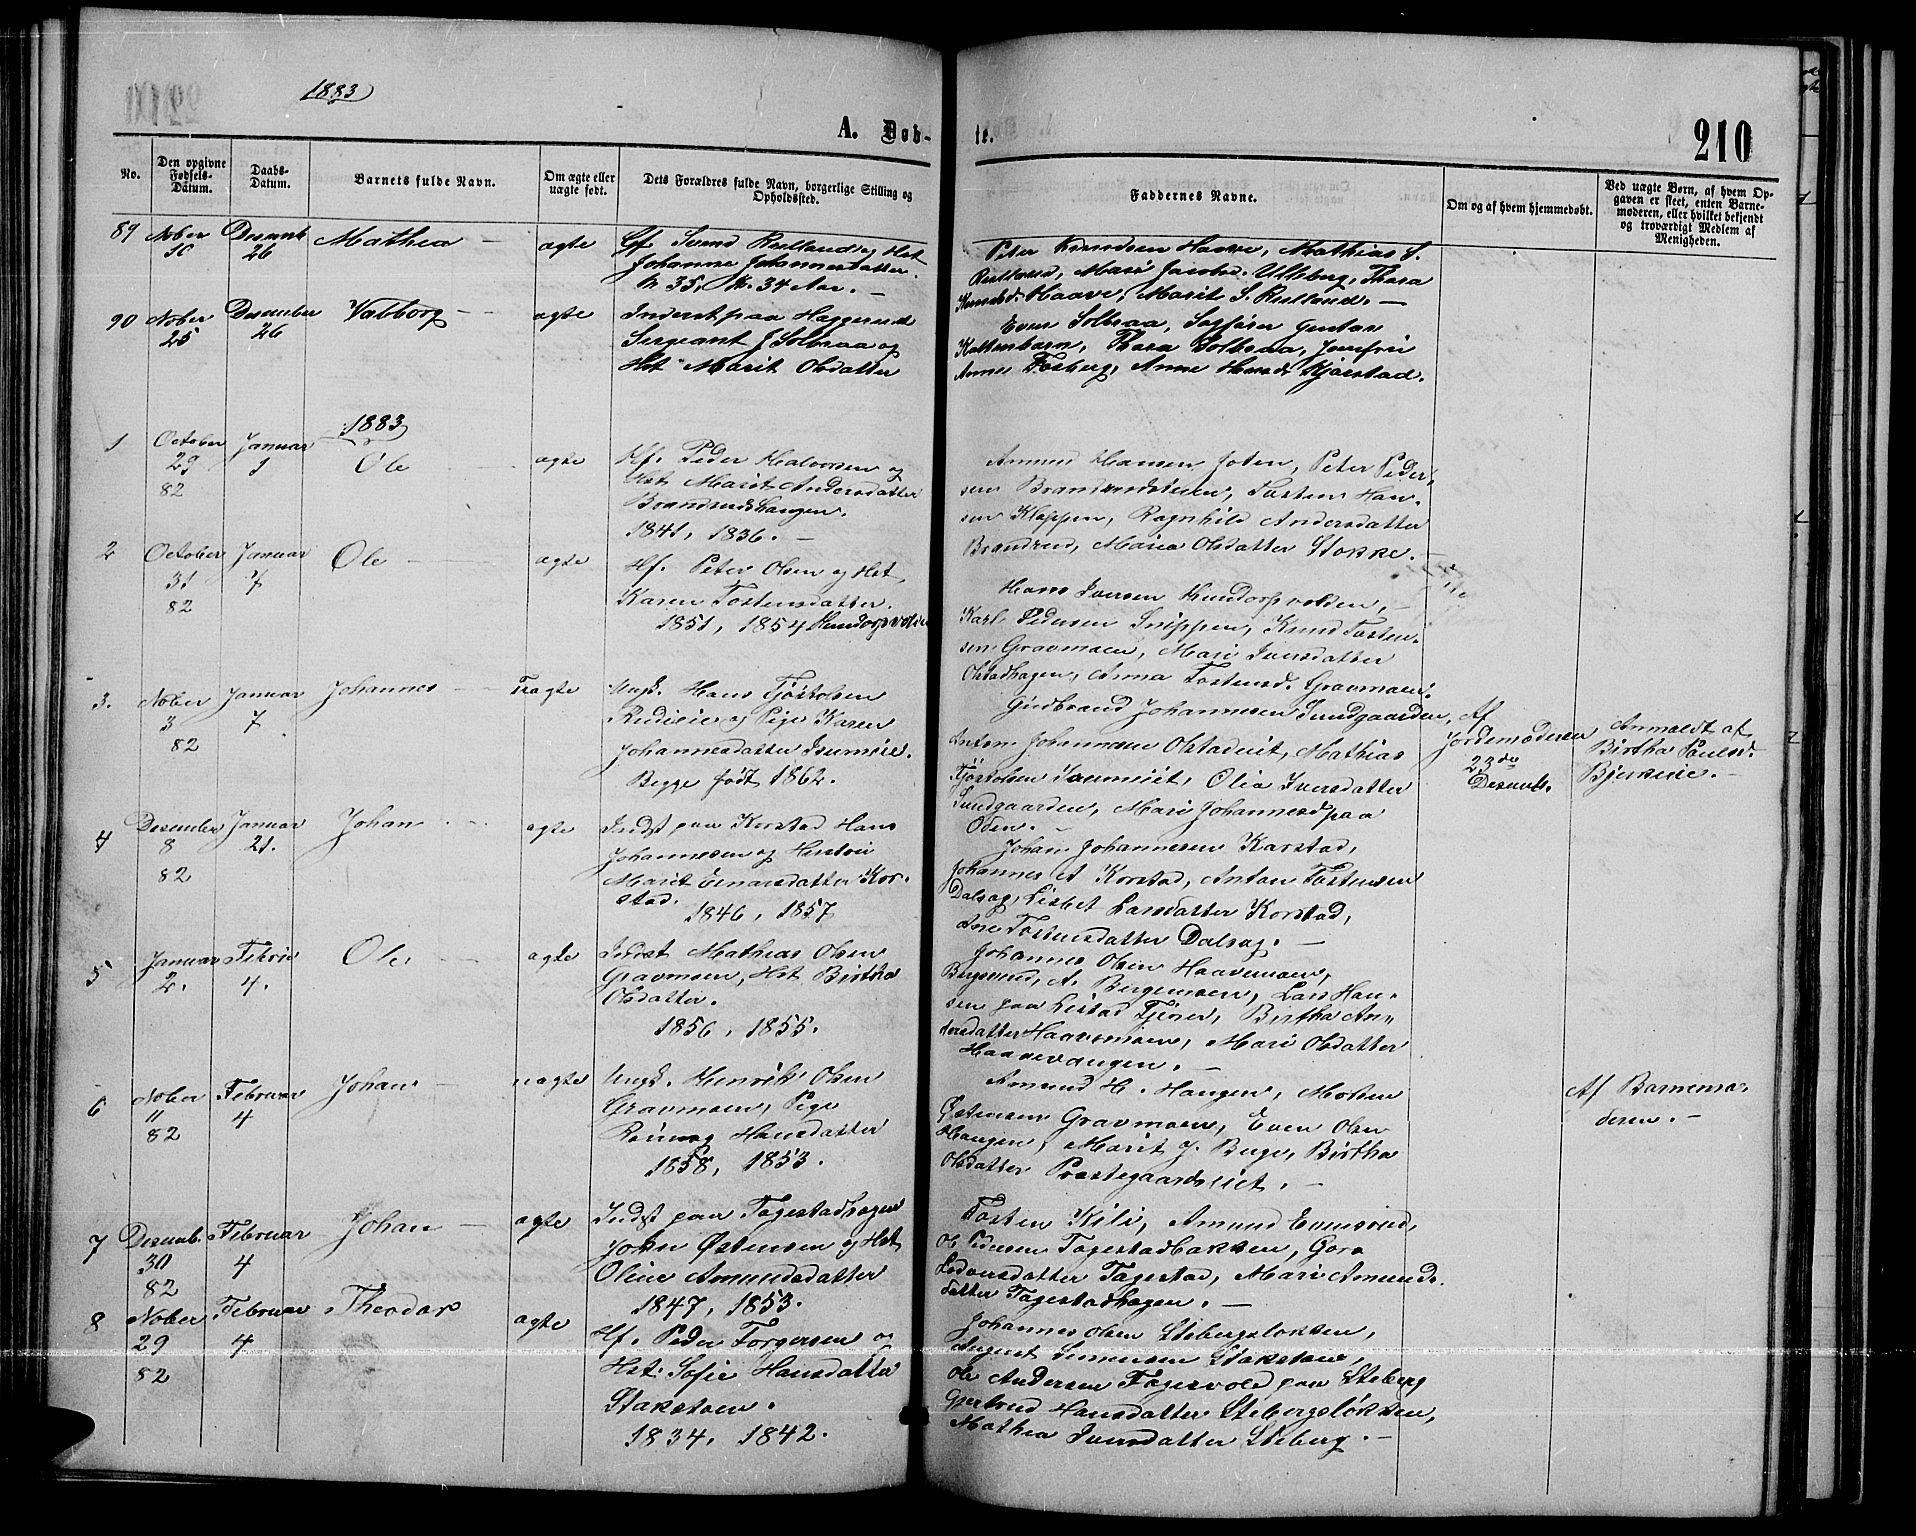 SAH, Sør-Fron prestekontor, H/Ha/Hab/L0002: Klokkerbok nr. 2, 1864-1883, s. 210